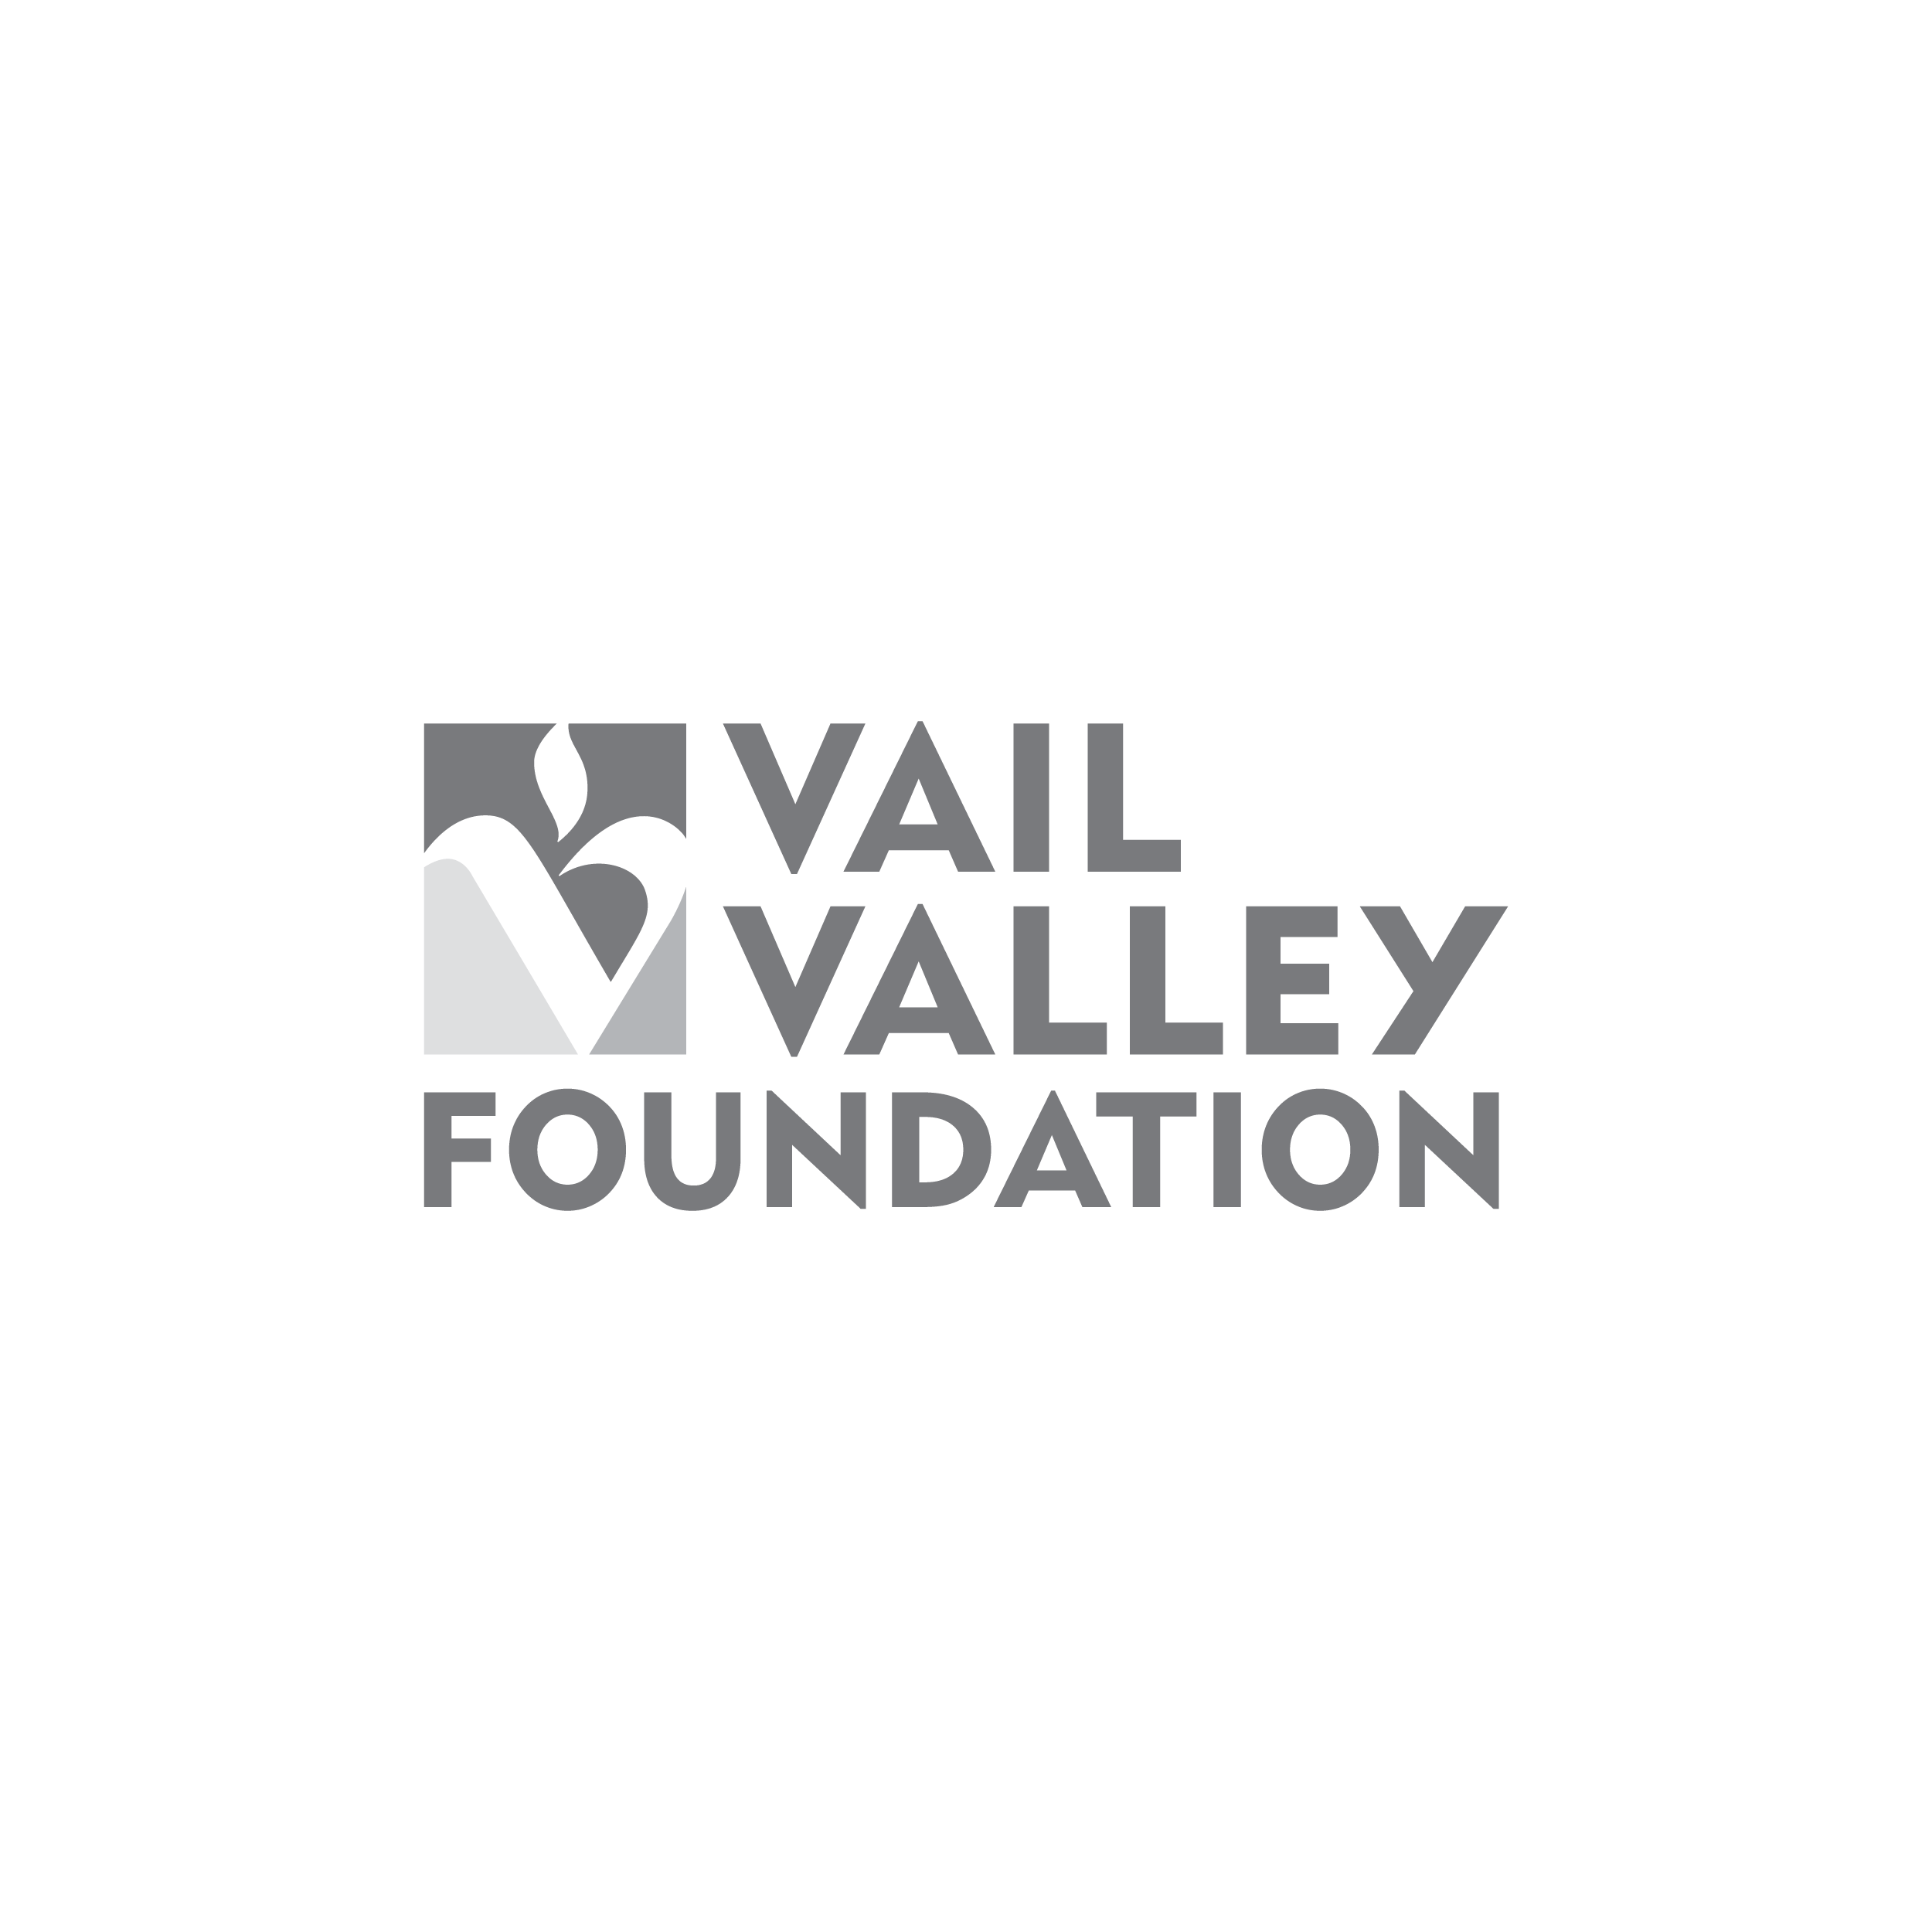 Vail Valley Foundation